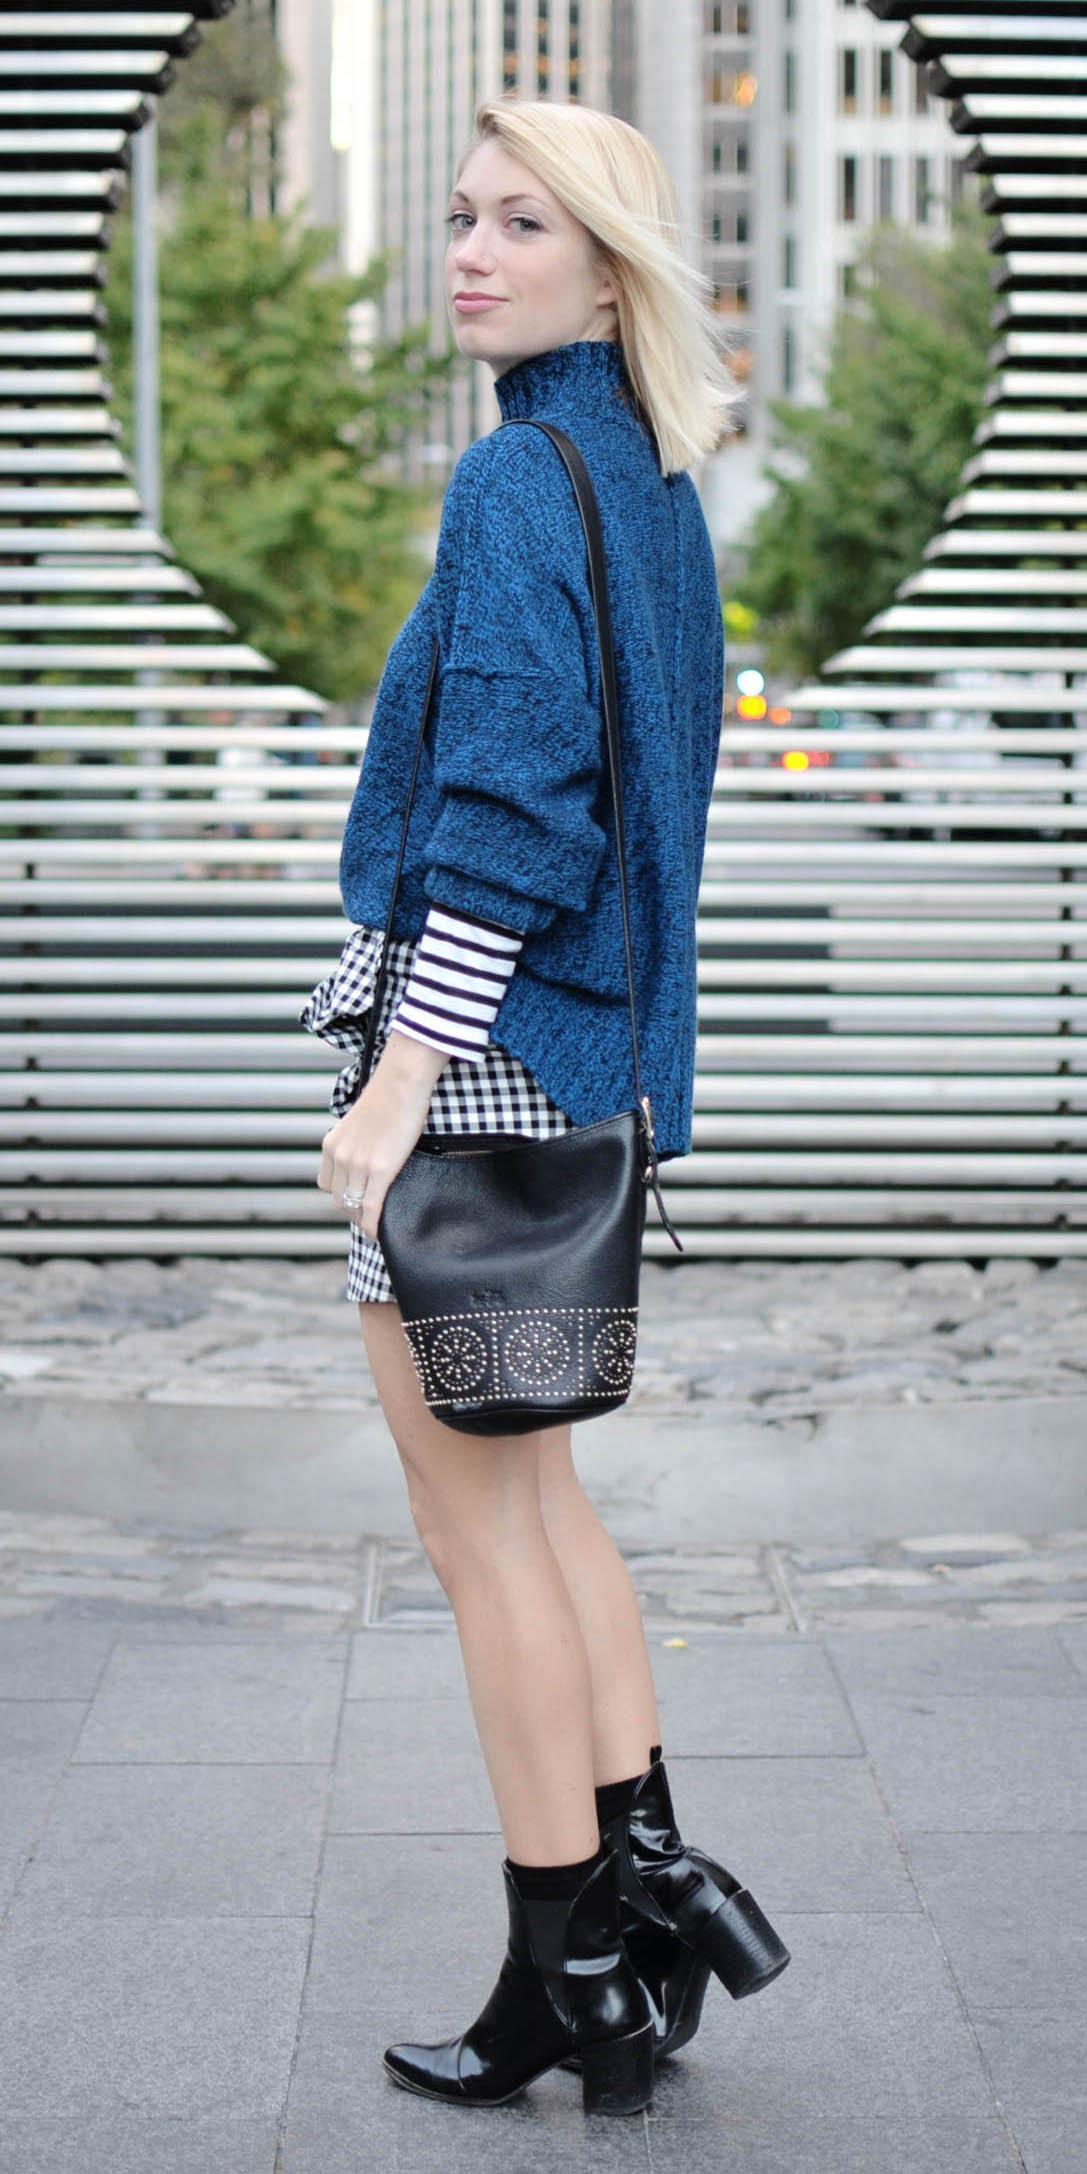 white-mini-skirt-gingham-print-blue-navy-sweater-turtleneck-black-bag-black-shoe-booties-fall-winter-blonde-lunch.jpg